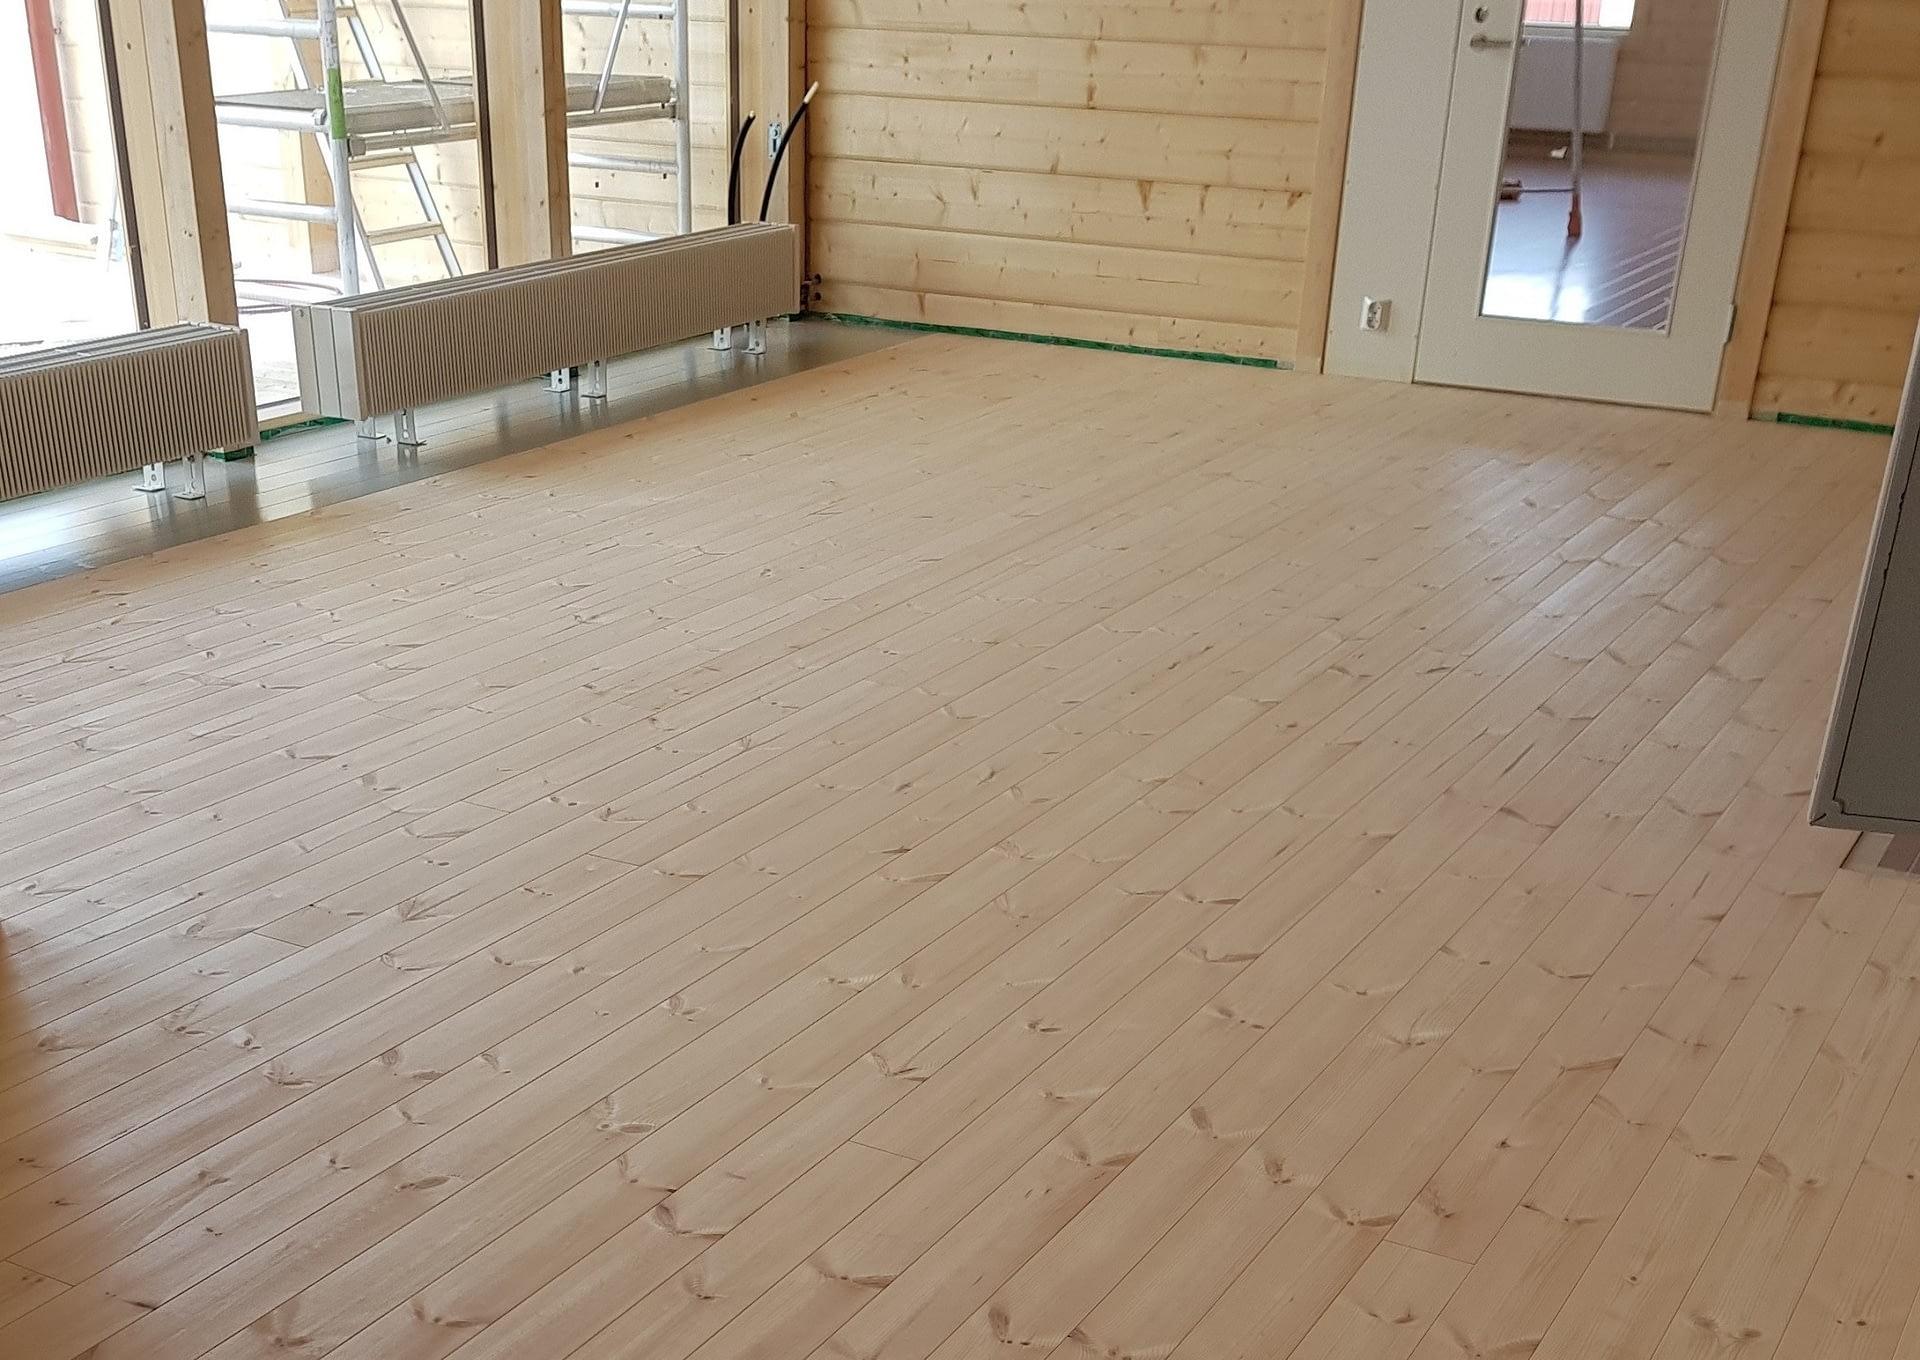 Northern spruce/ pine flooring